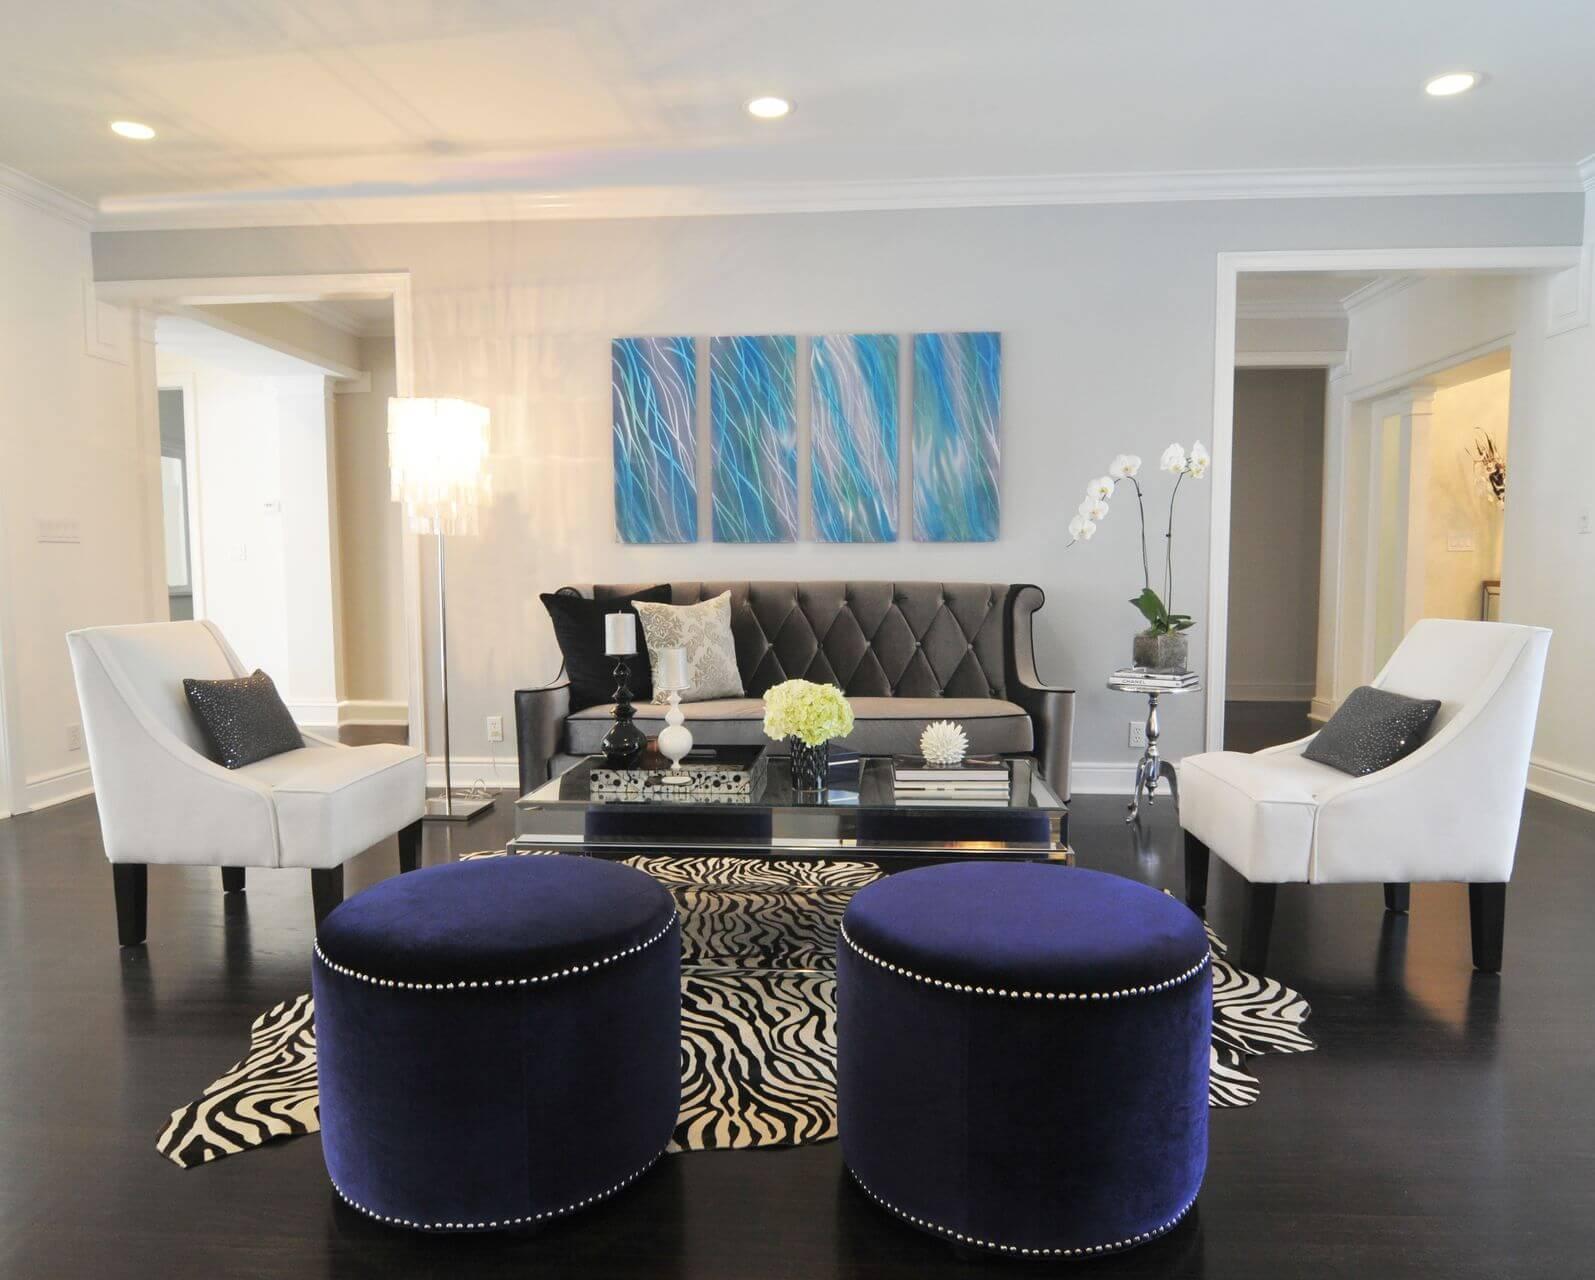 17 Zebra Living Room Decor Ideas Pictures